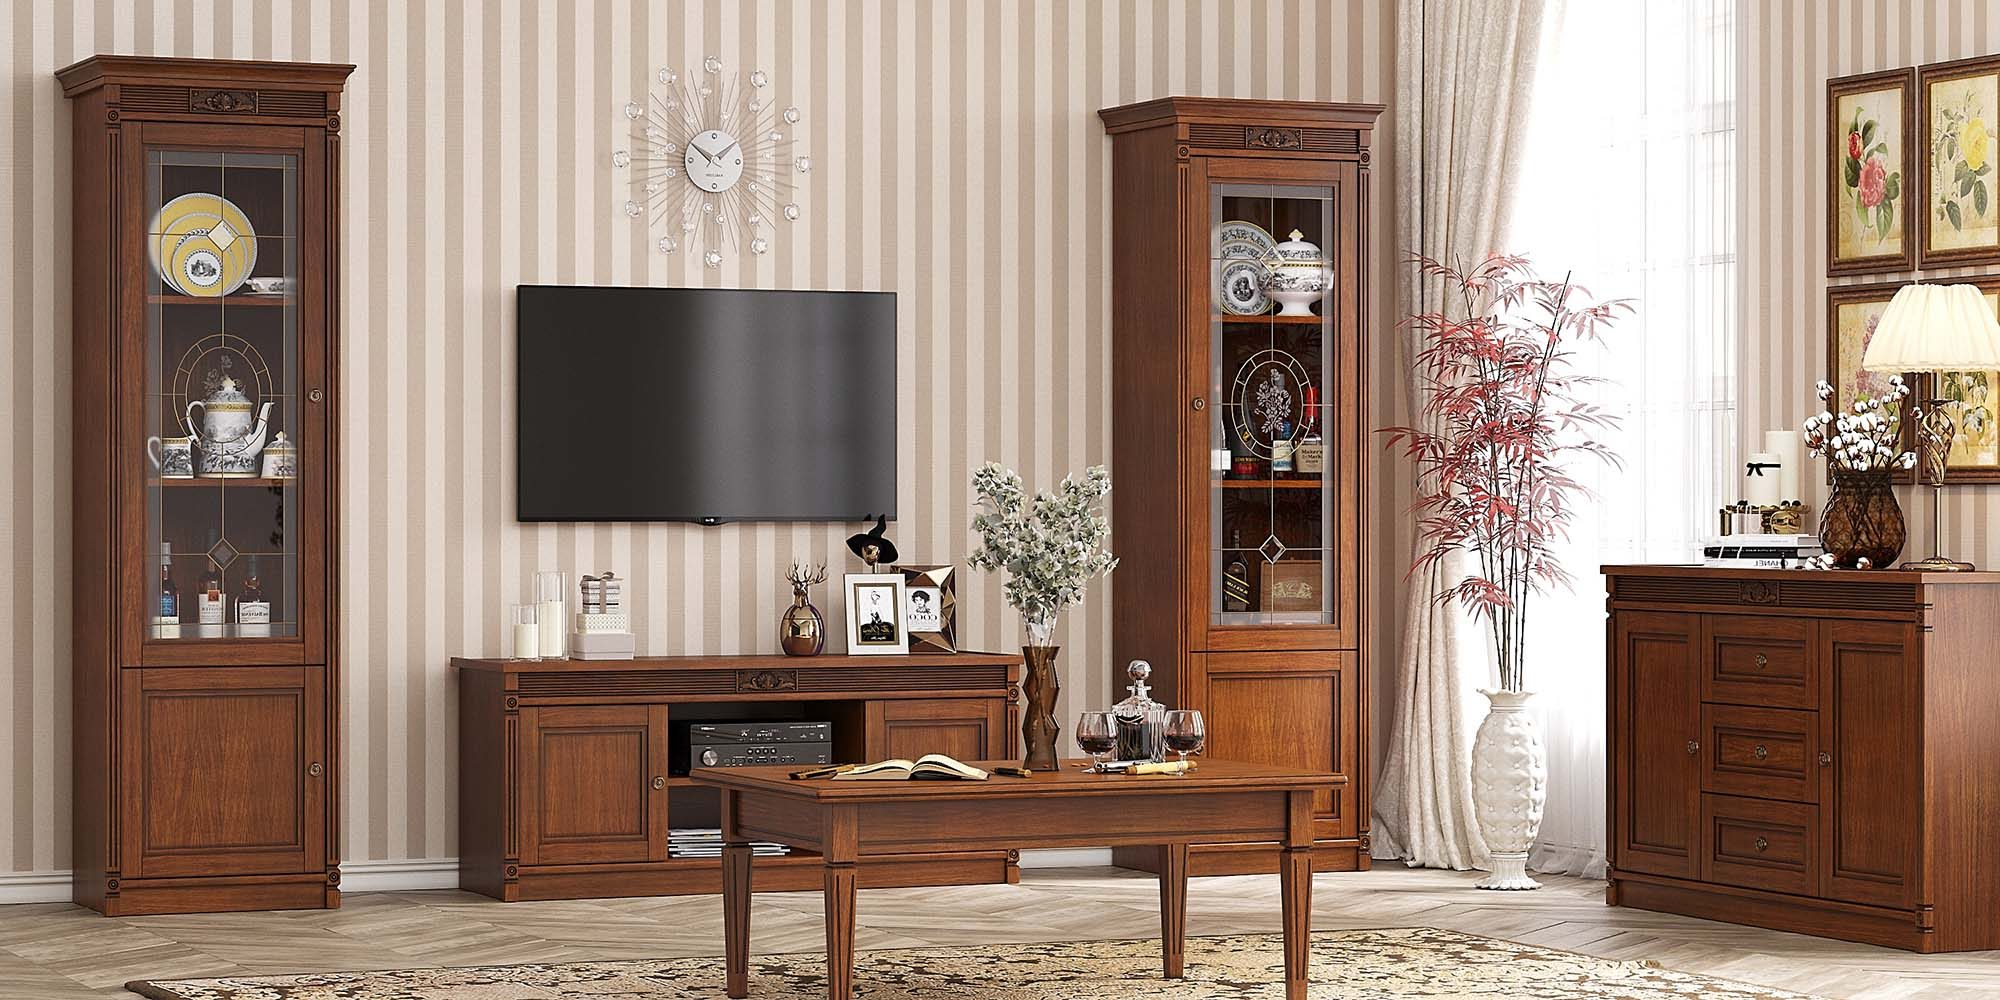 Living-room_02_Marsel-e1500464890686